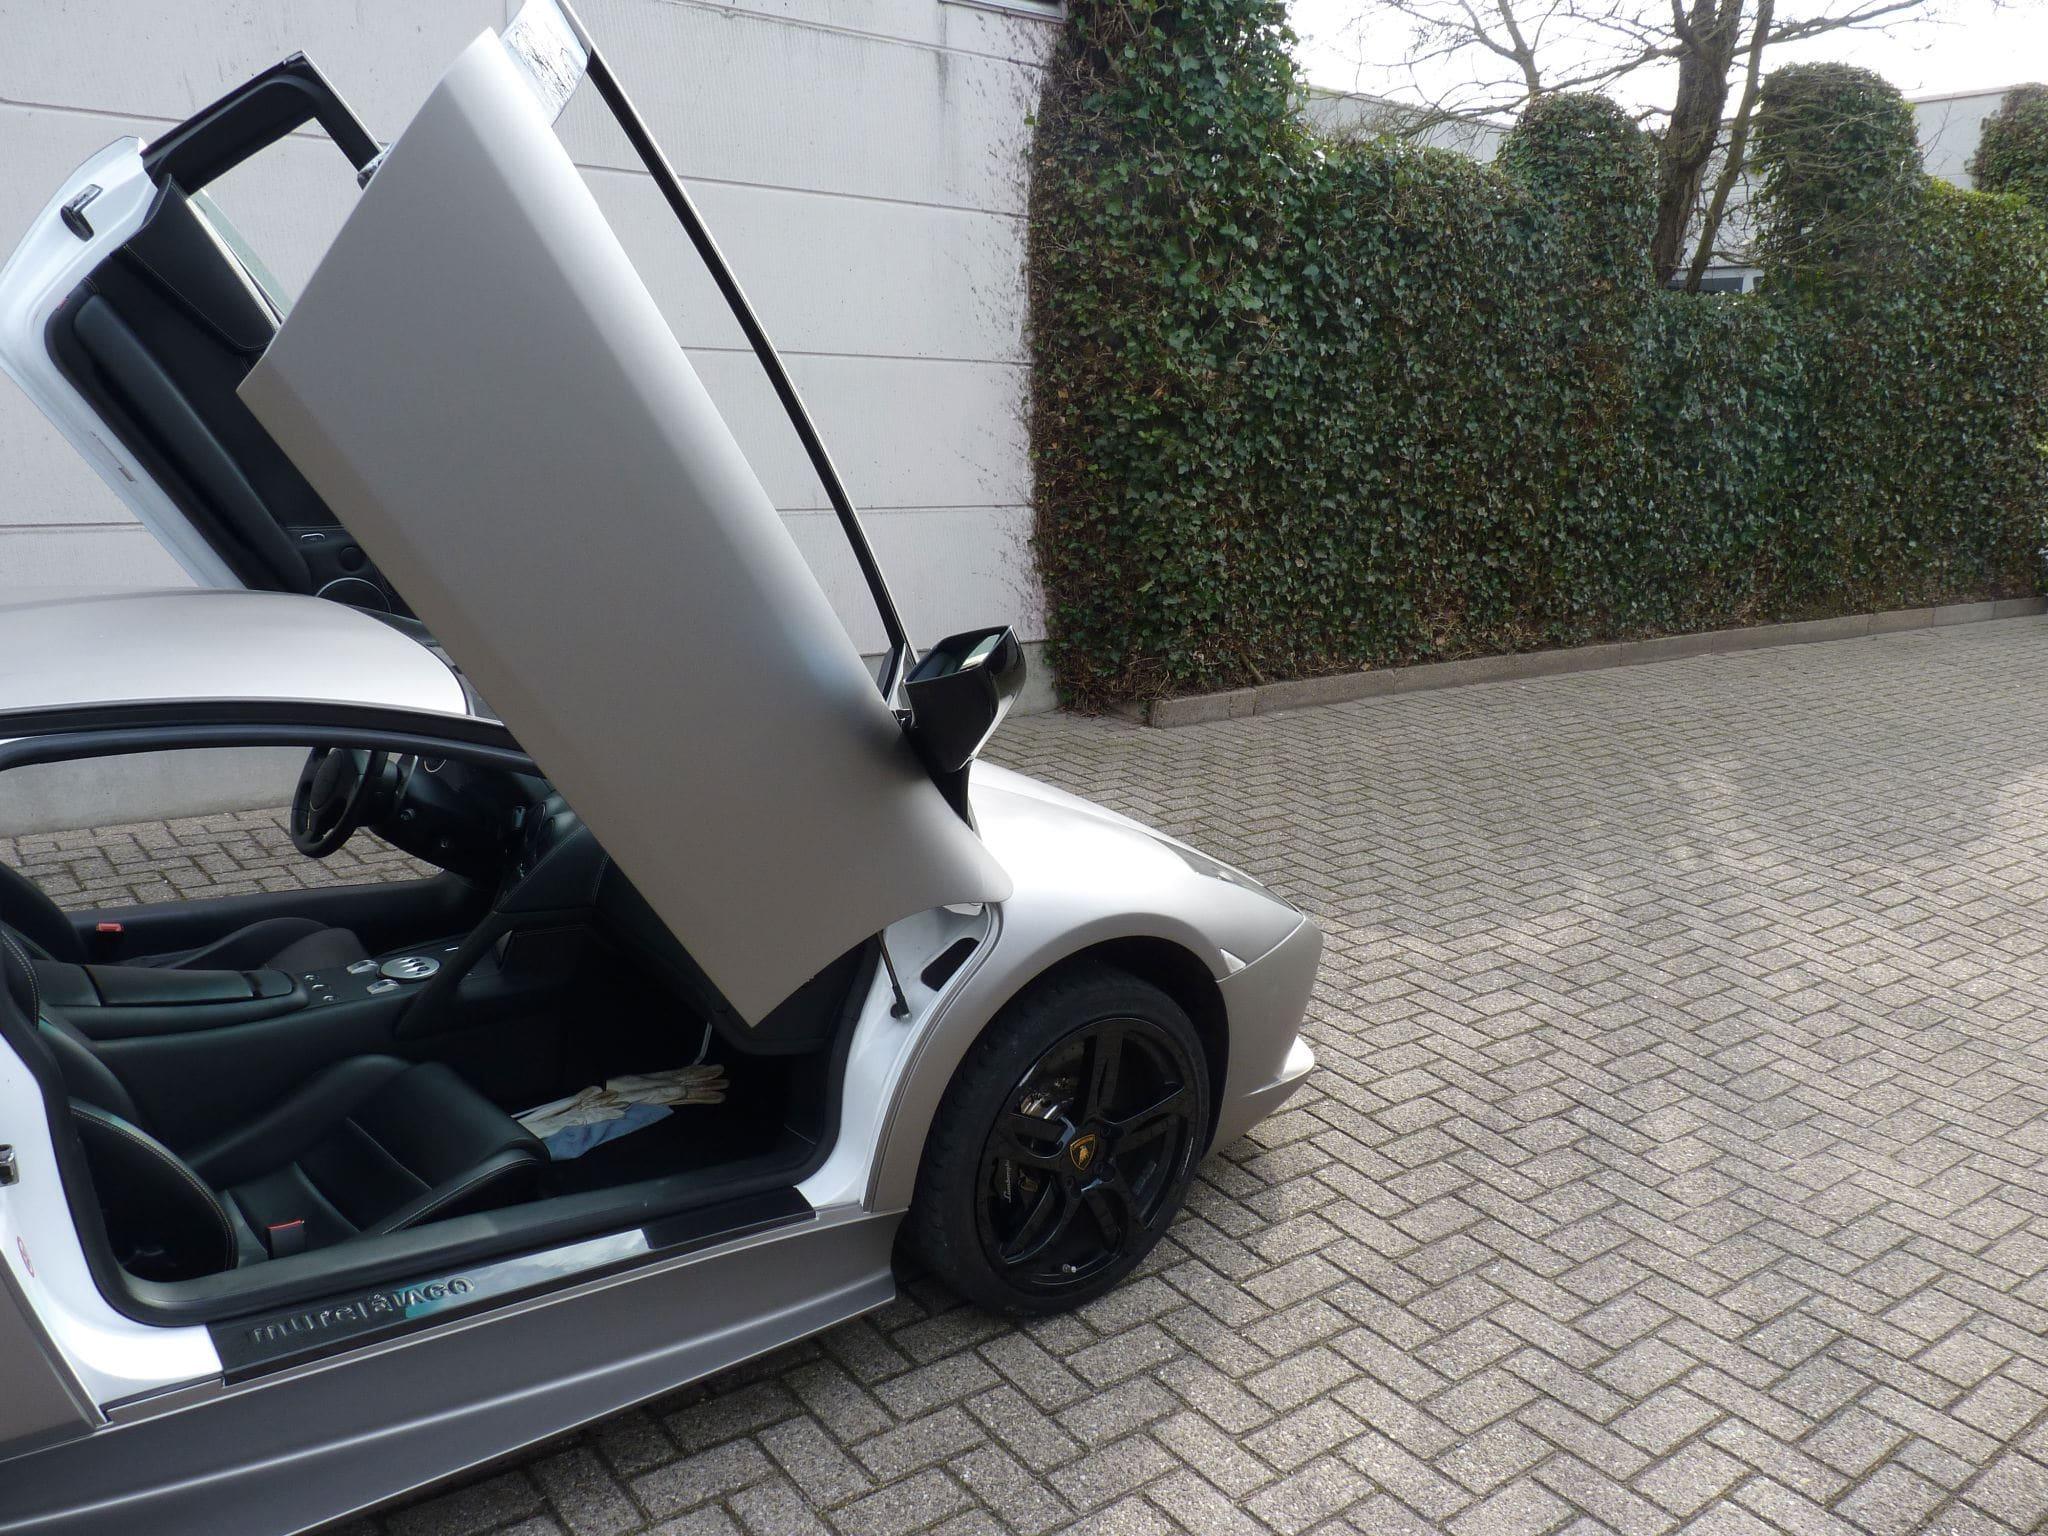 Lamborghini Murcialago LP670 met Gunpowder Wrap, Carwrapping door Wrapmyride.nu Foto-nr:5996, ©2021